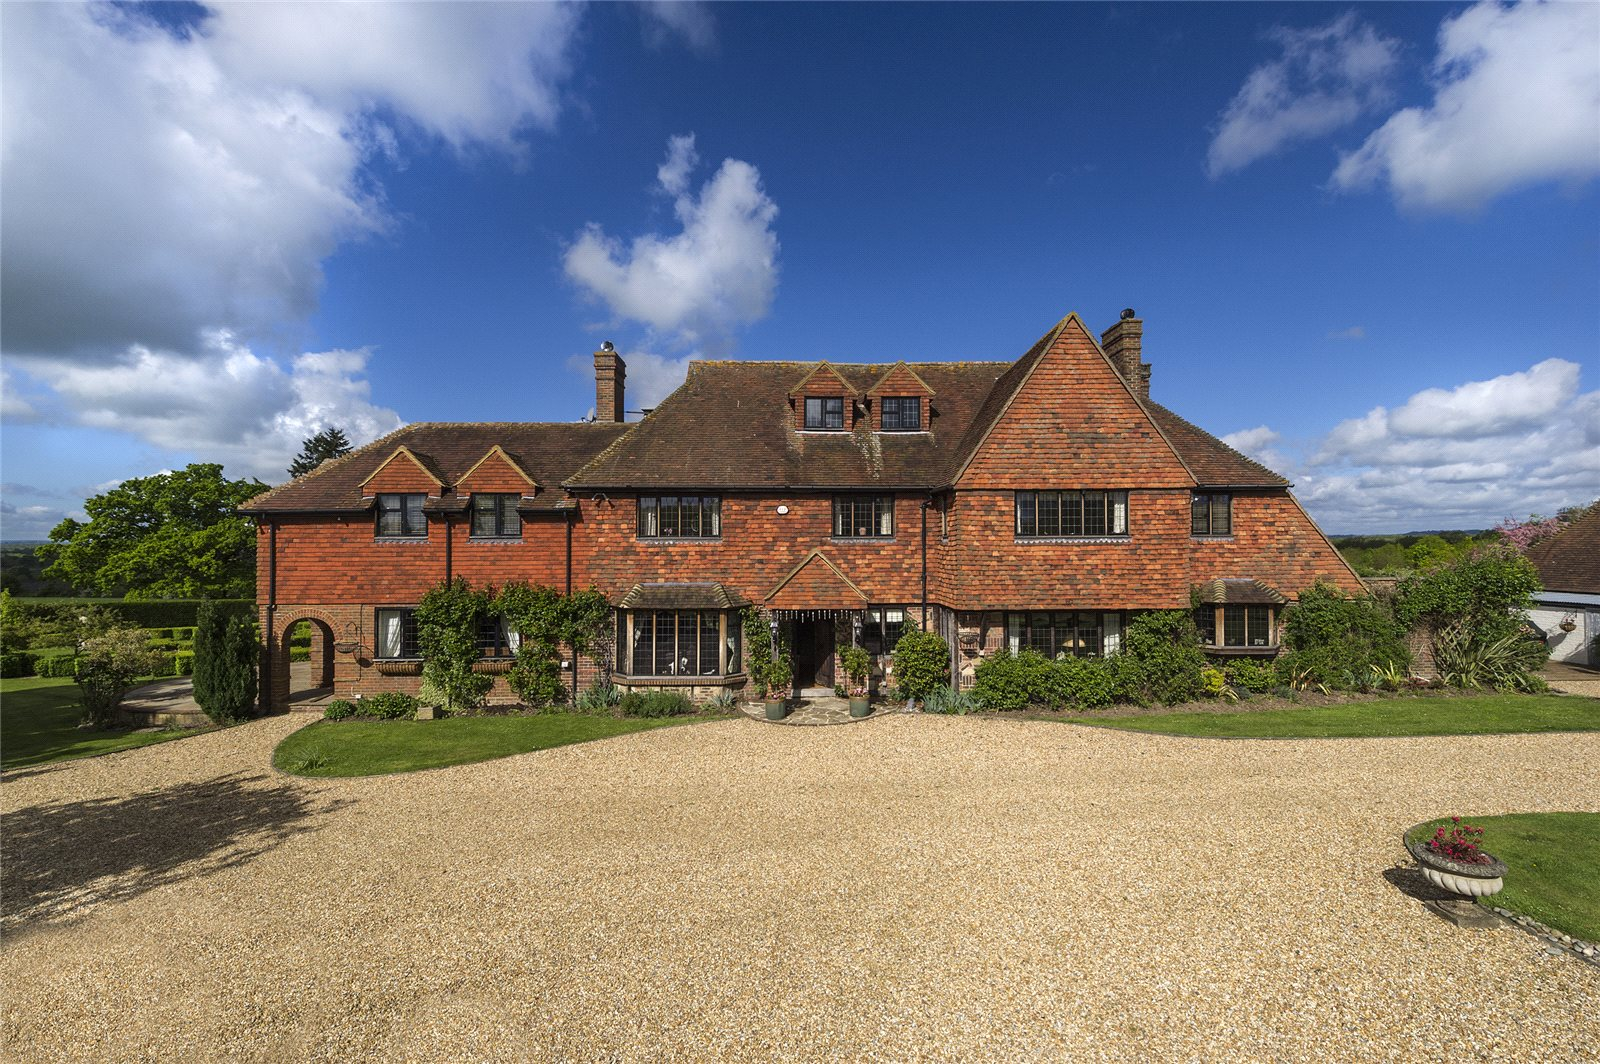 Moradia para Venda às Pigbush Lane, Loxwood, Billingshurst, West Sussex, RH14 Billingshurst, Inglaterra